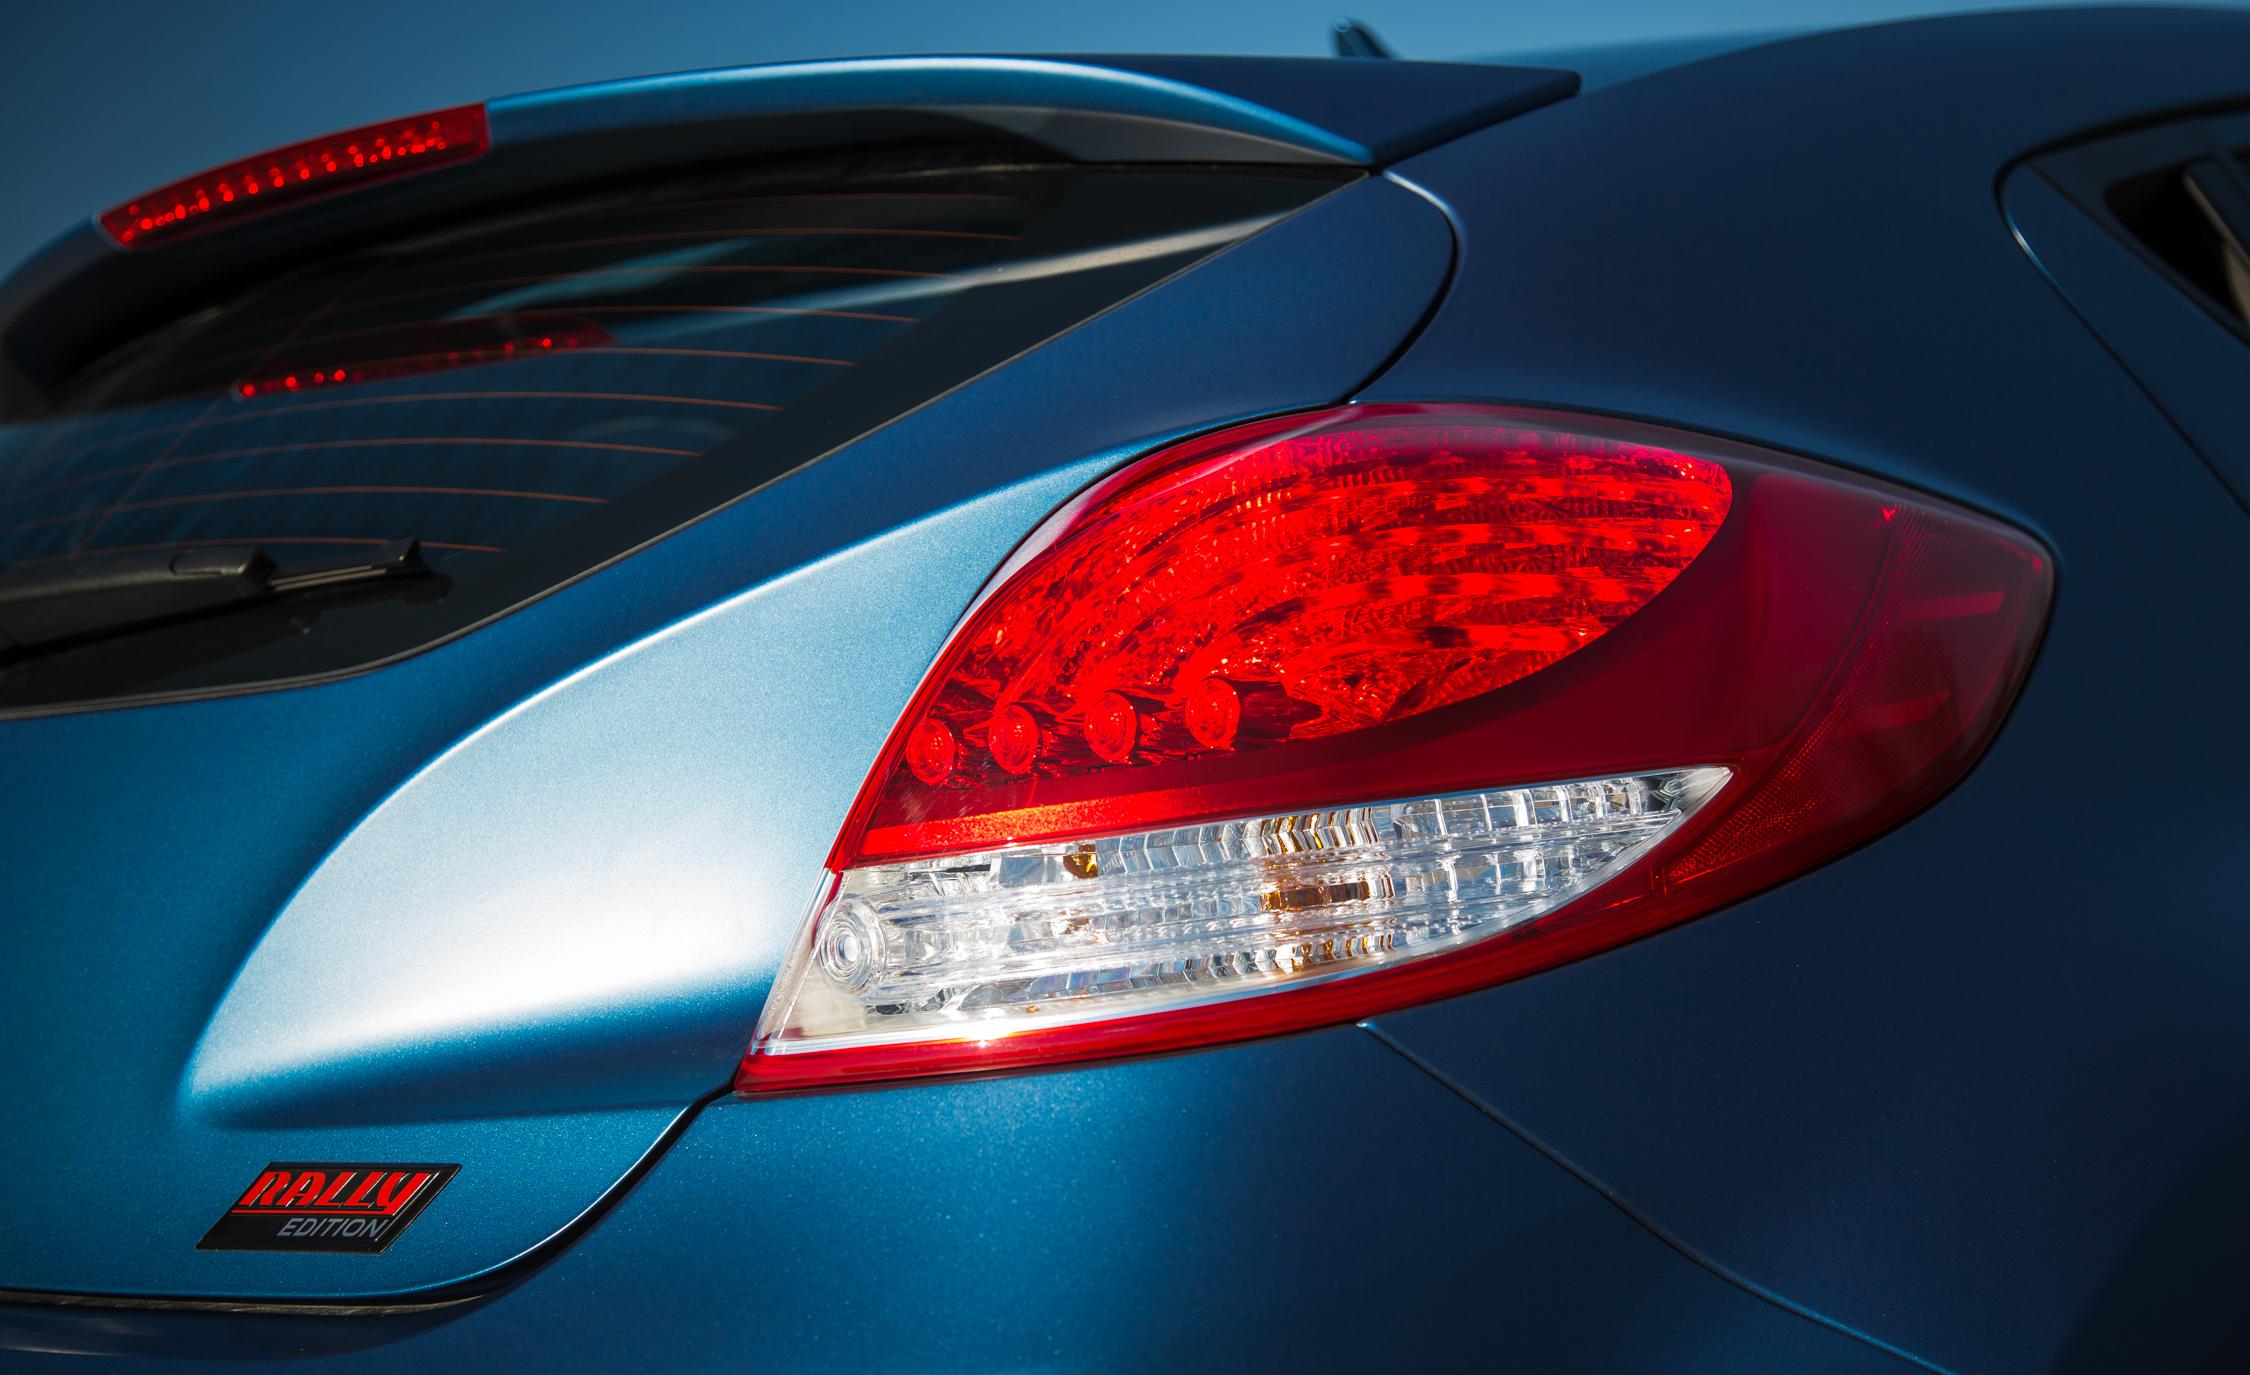 2016 Hyundai Veloster Turbo Rally Edition Exterior Taillight Rear Right